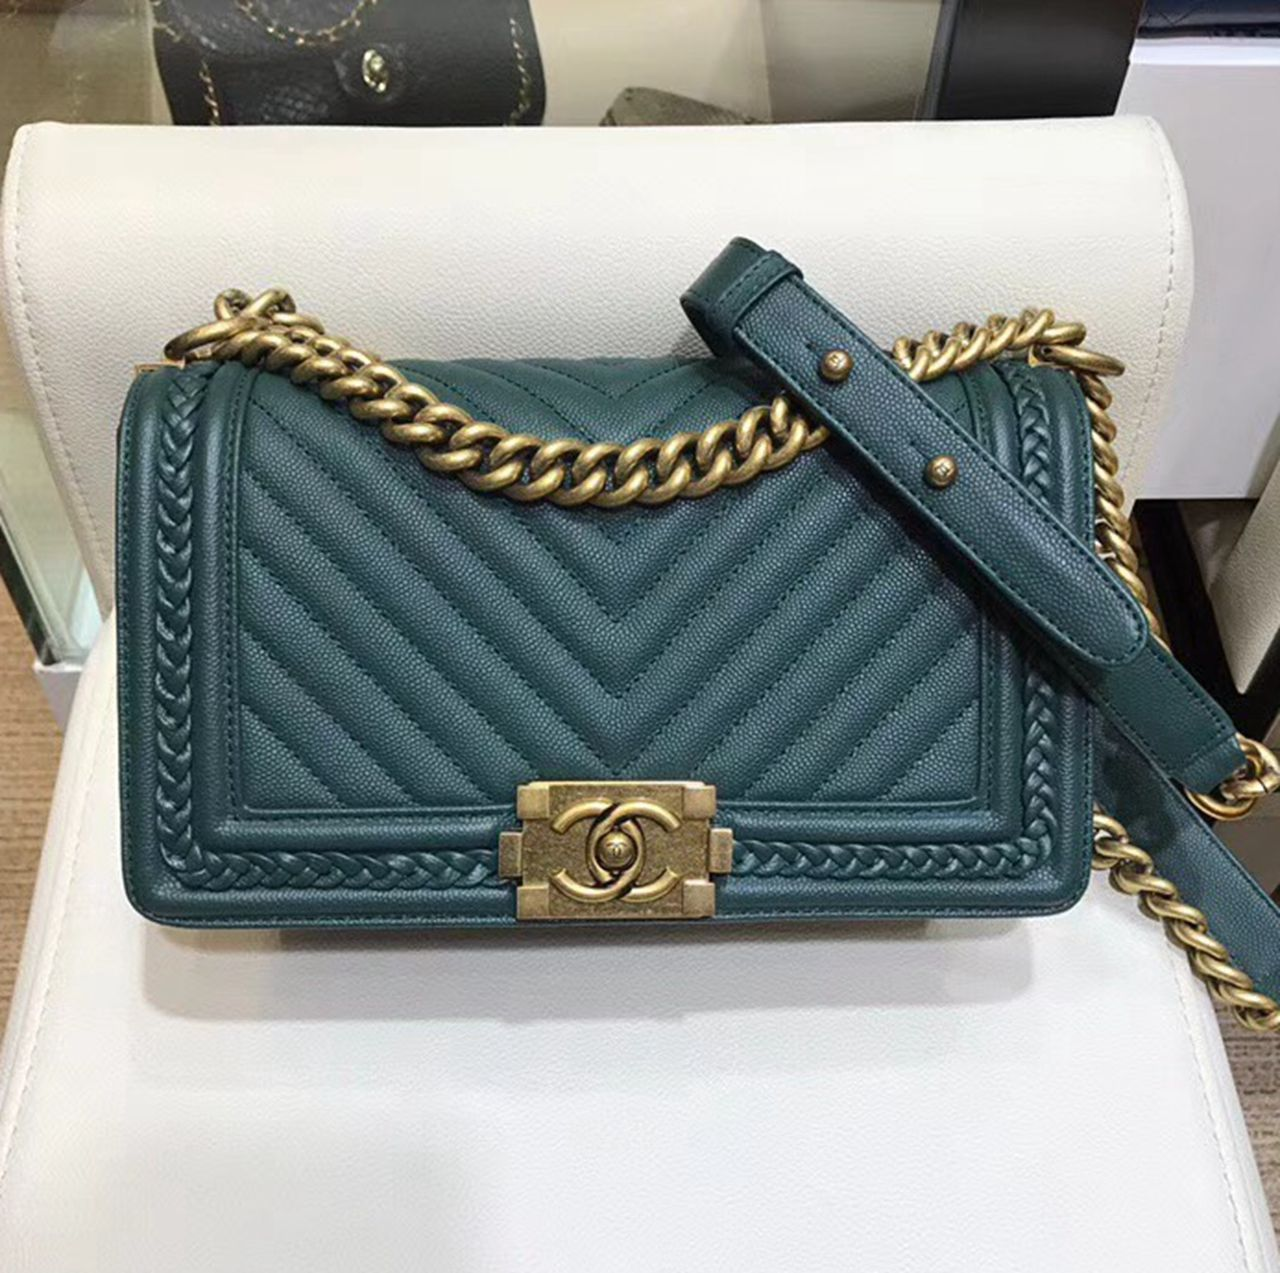 e5d79dde337b Chanel Chevron Boy Braided Old Medium Flap Bag A67086 Green Curise  2018(Top) #chanelchevronboybag